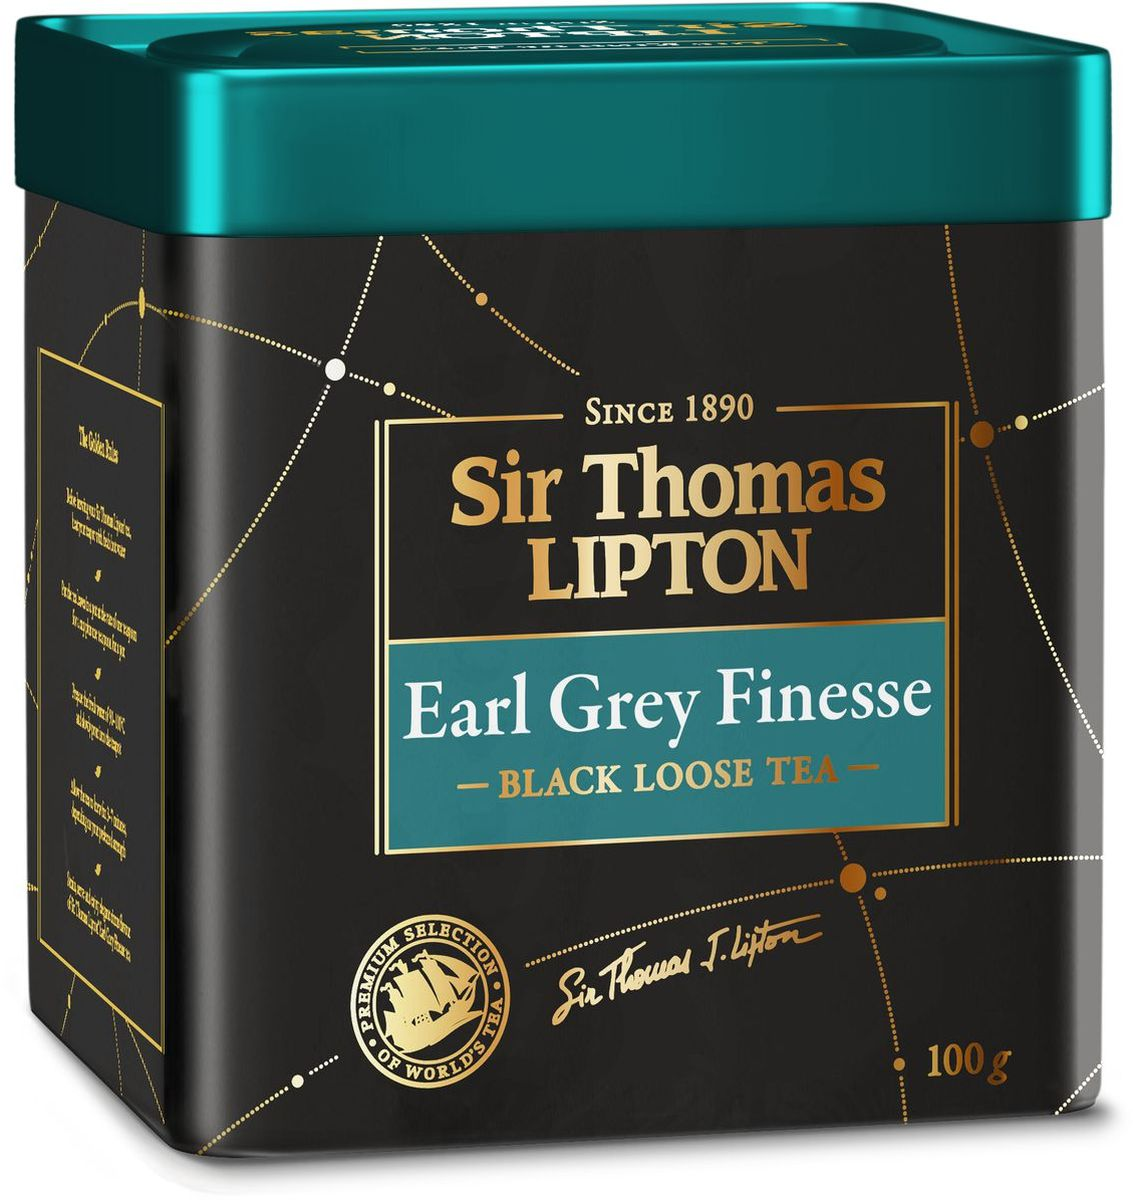 Sir Thomas Lipton Earl Grey Finesse чай черный ароматизированный, 100 г чай twinings твайнингc earl gray эрл грей черный 100г ж б великобритания